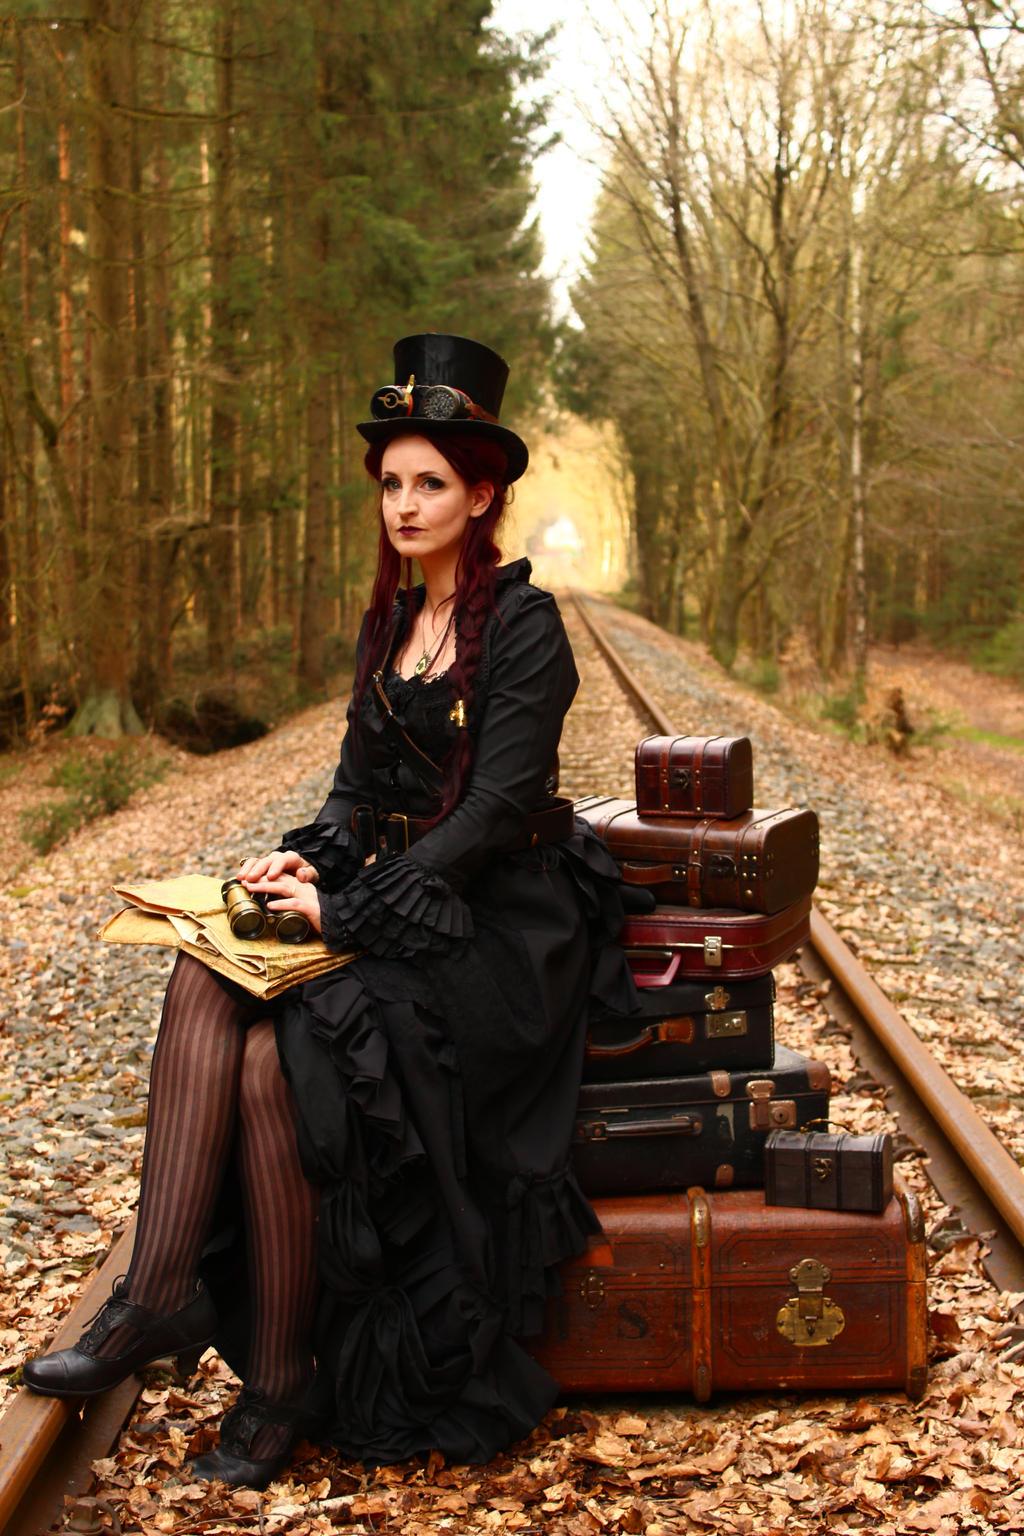 Stock - Steampunk railroad trip waiting pose 2